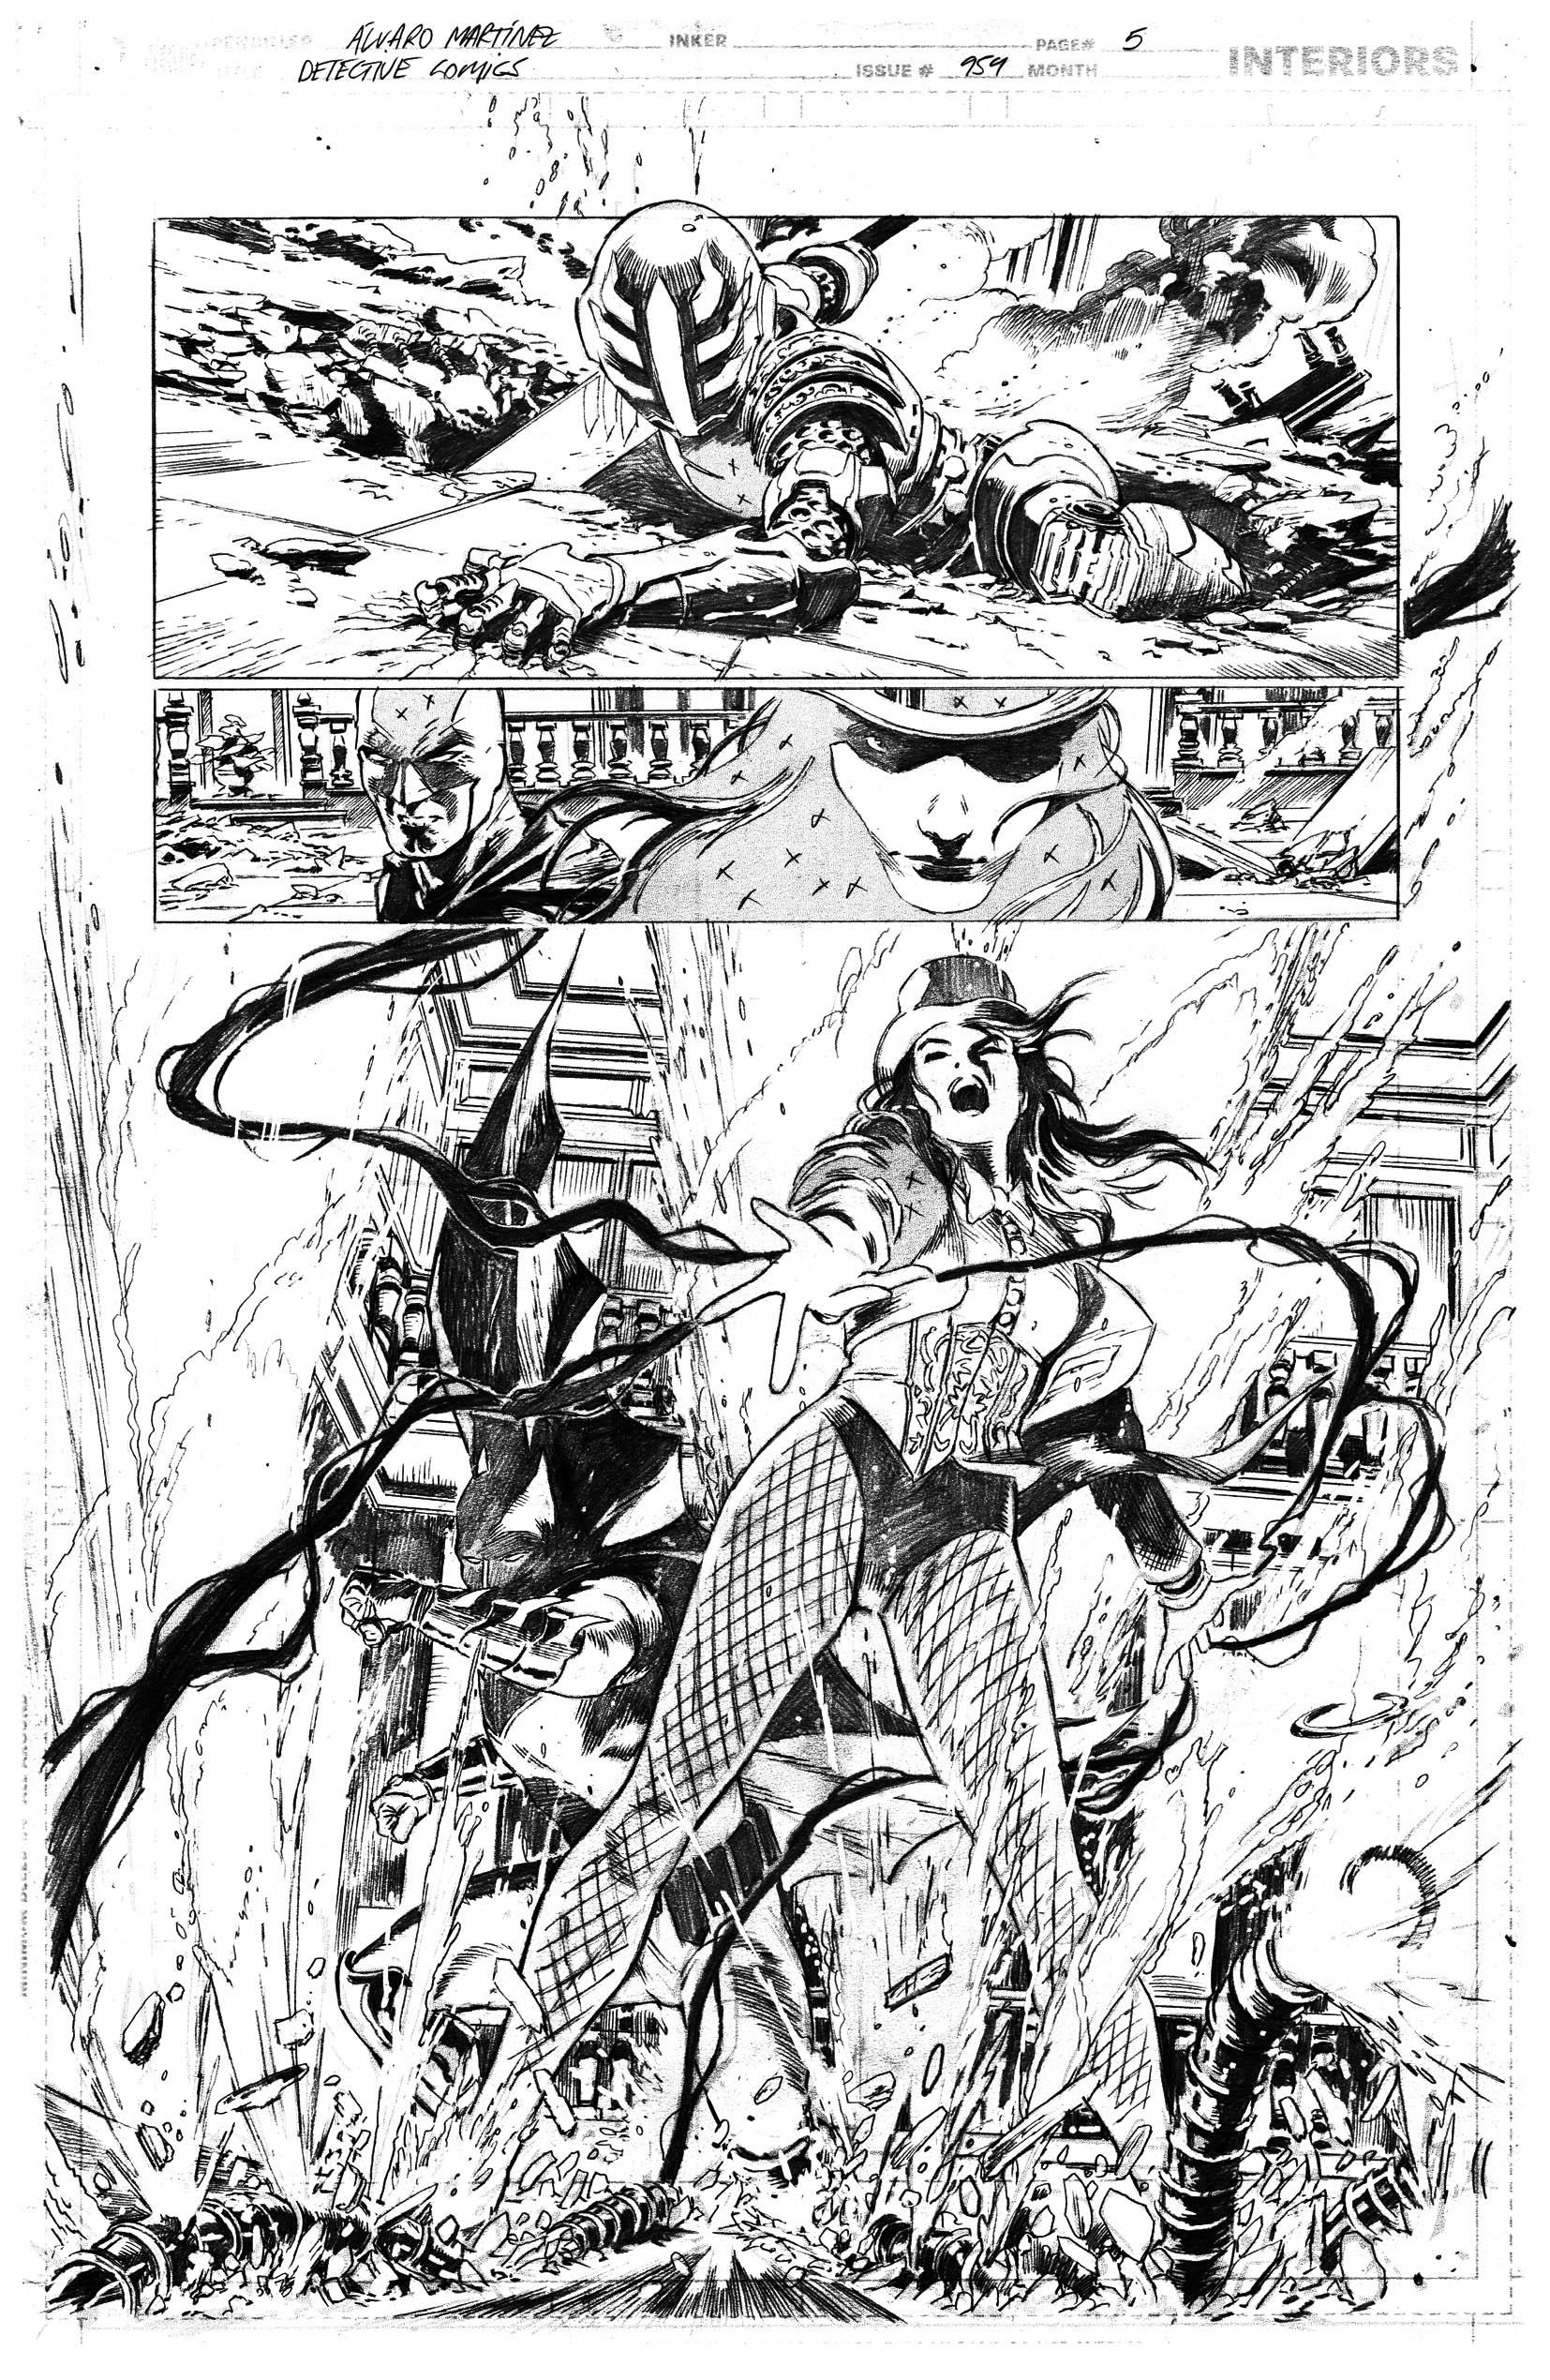 Detective Comics #959 page 5